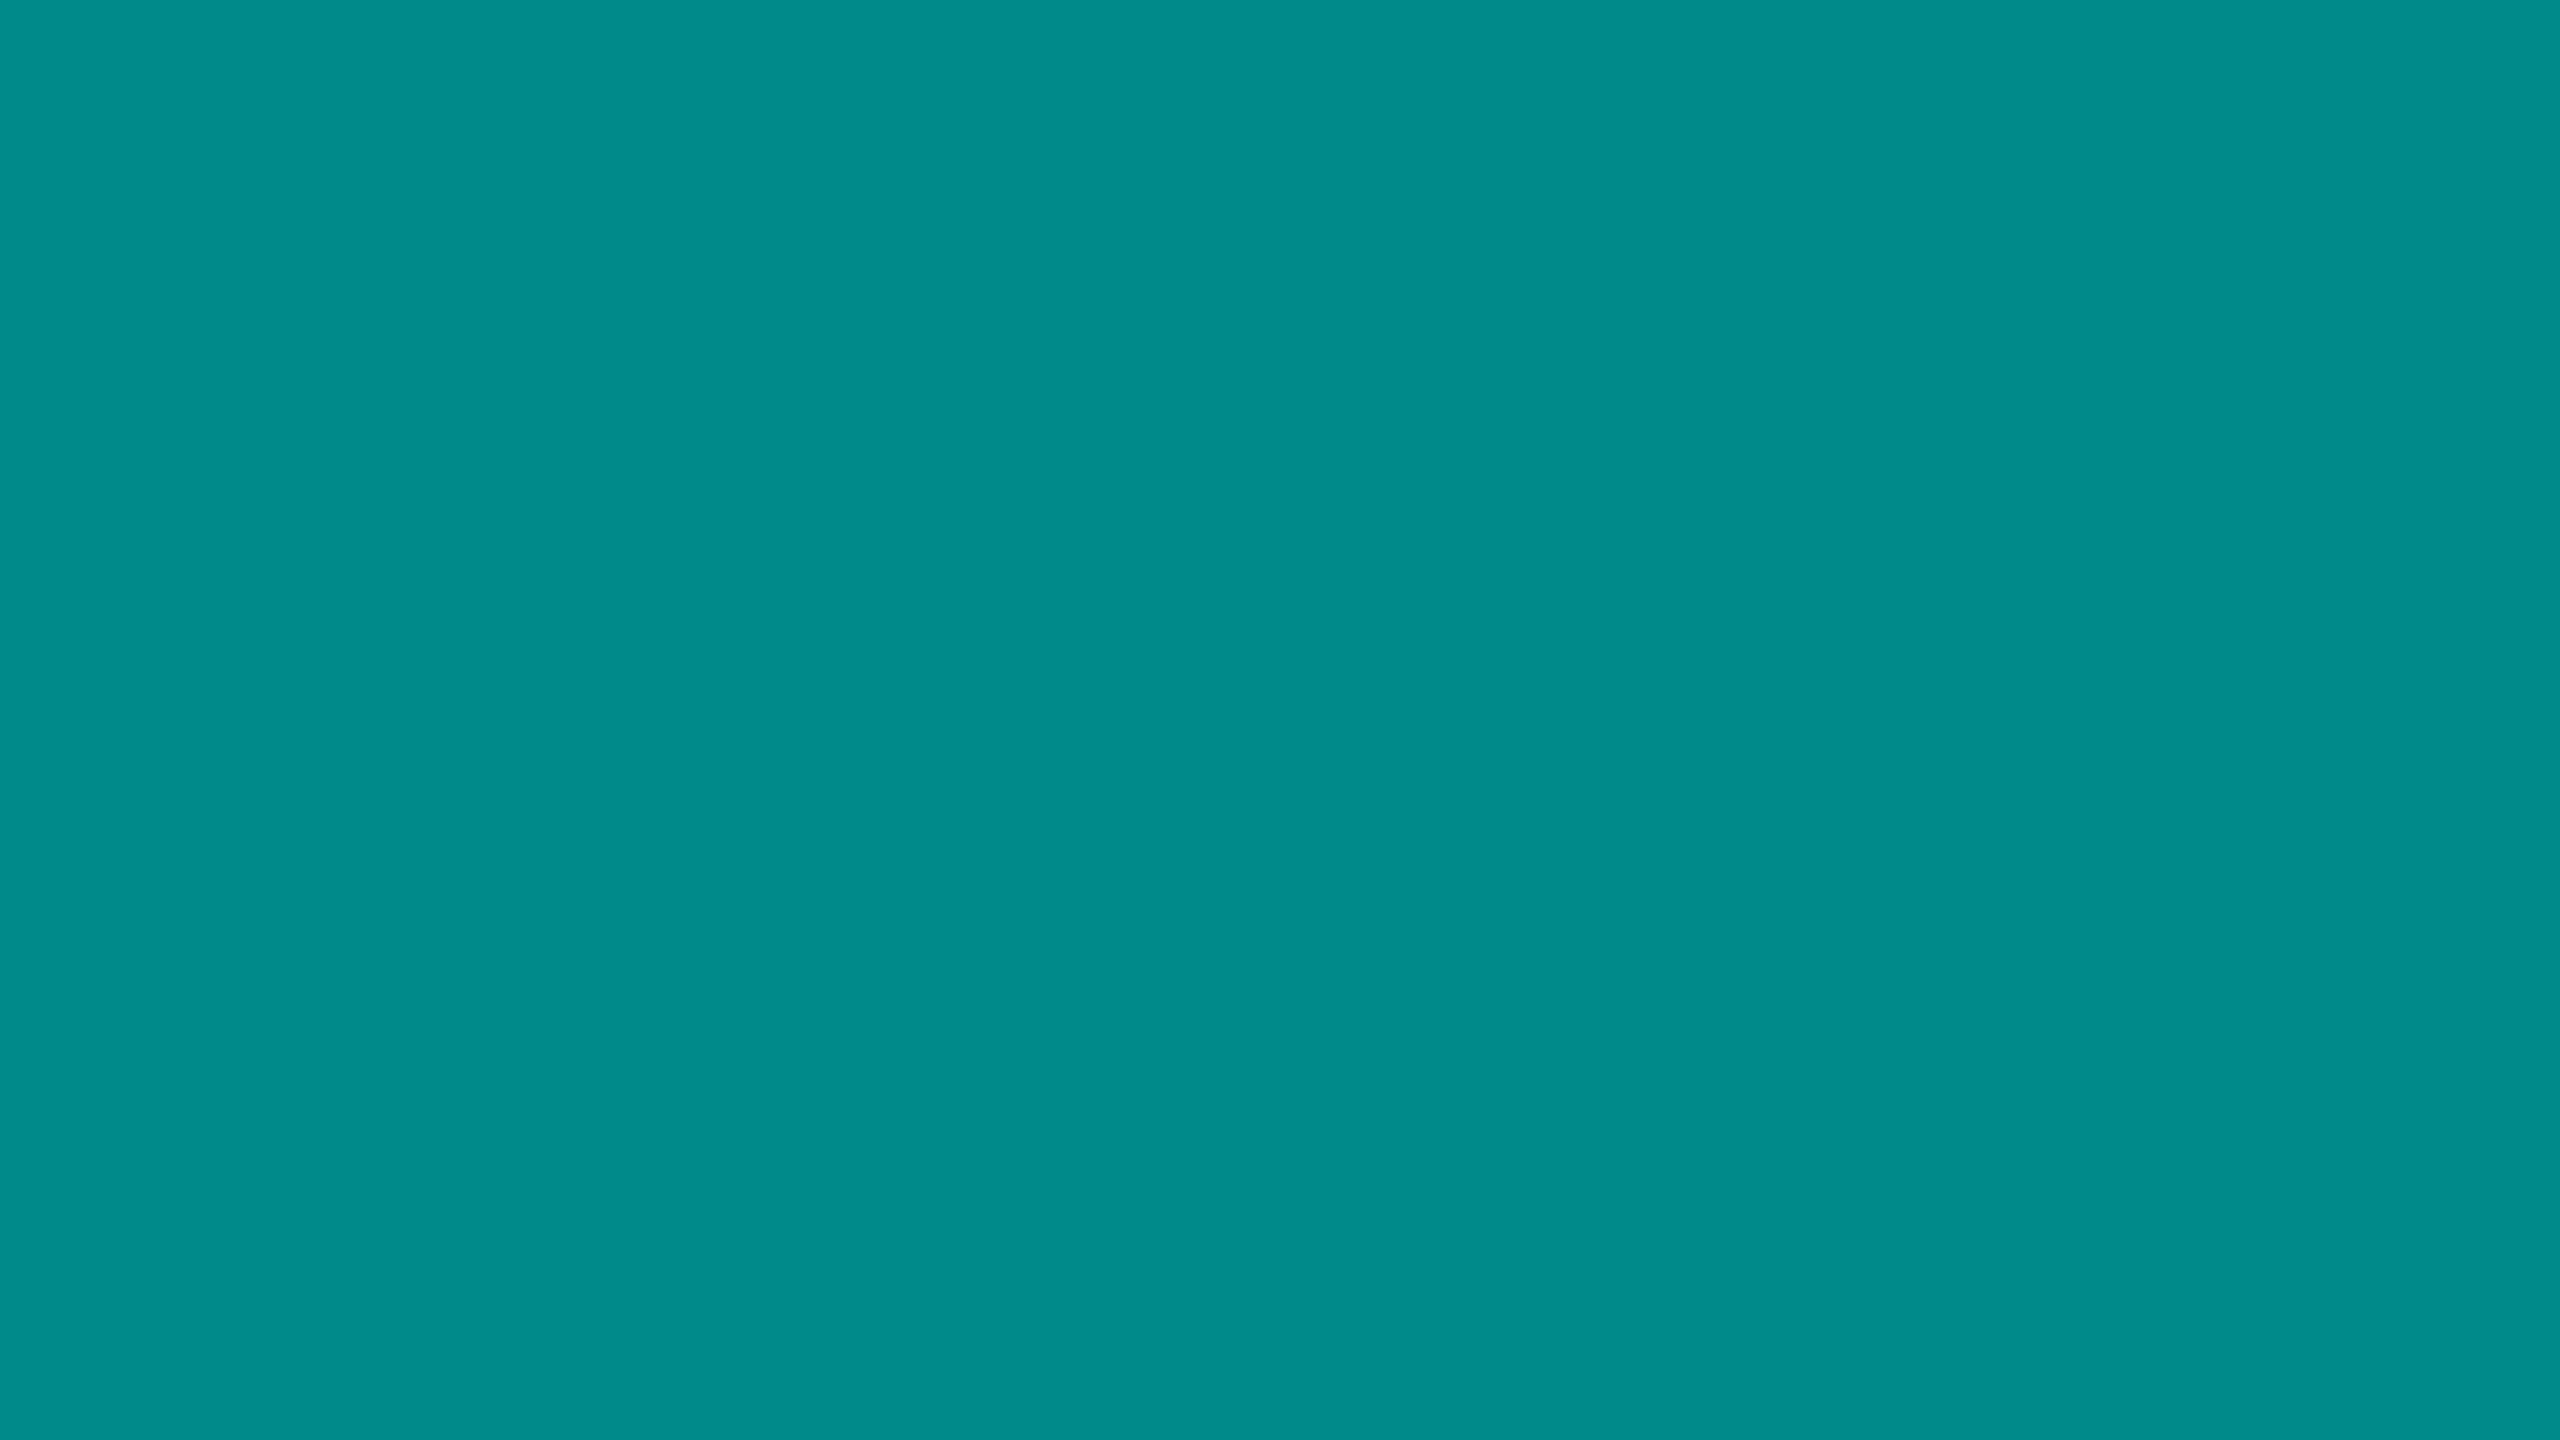 2560x1440 Dark Cyan Solid Color Background